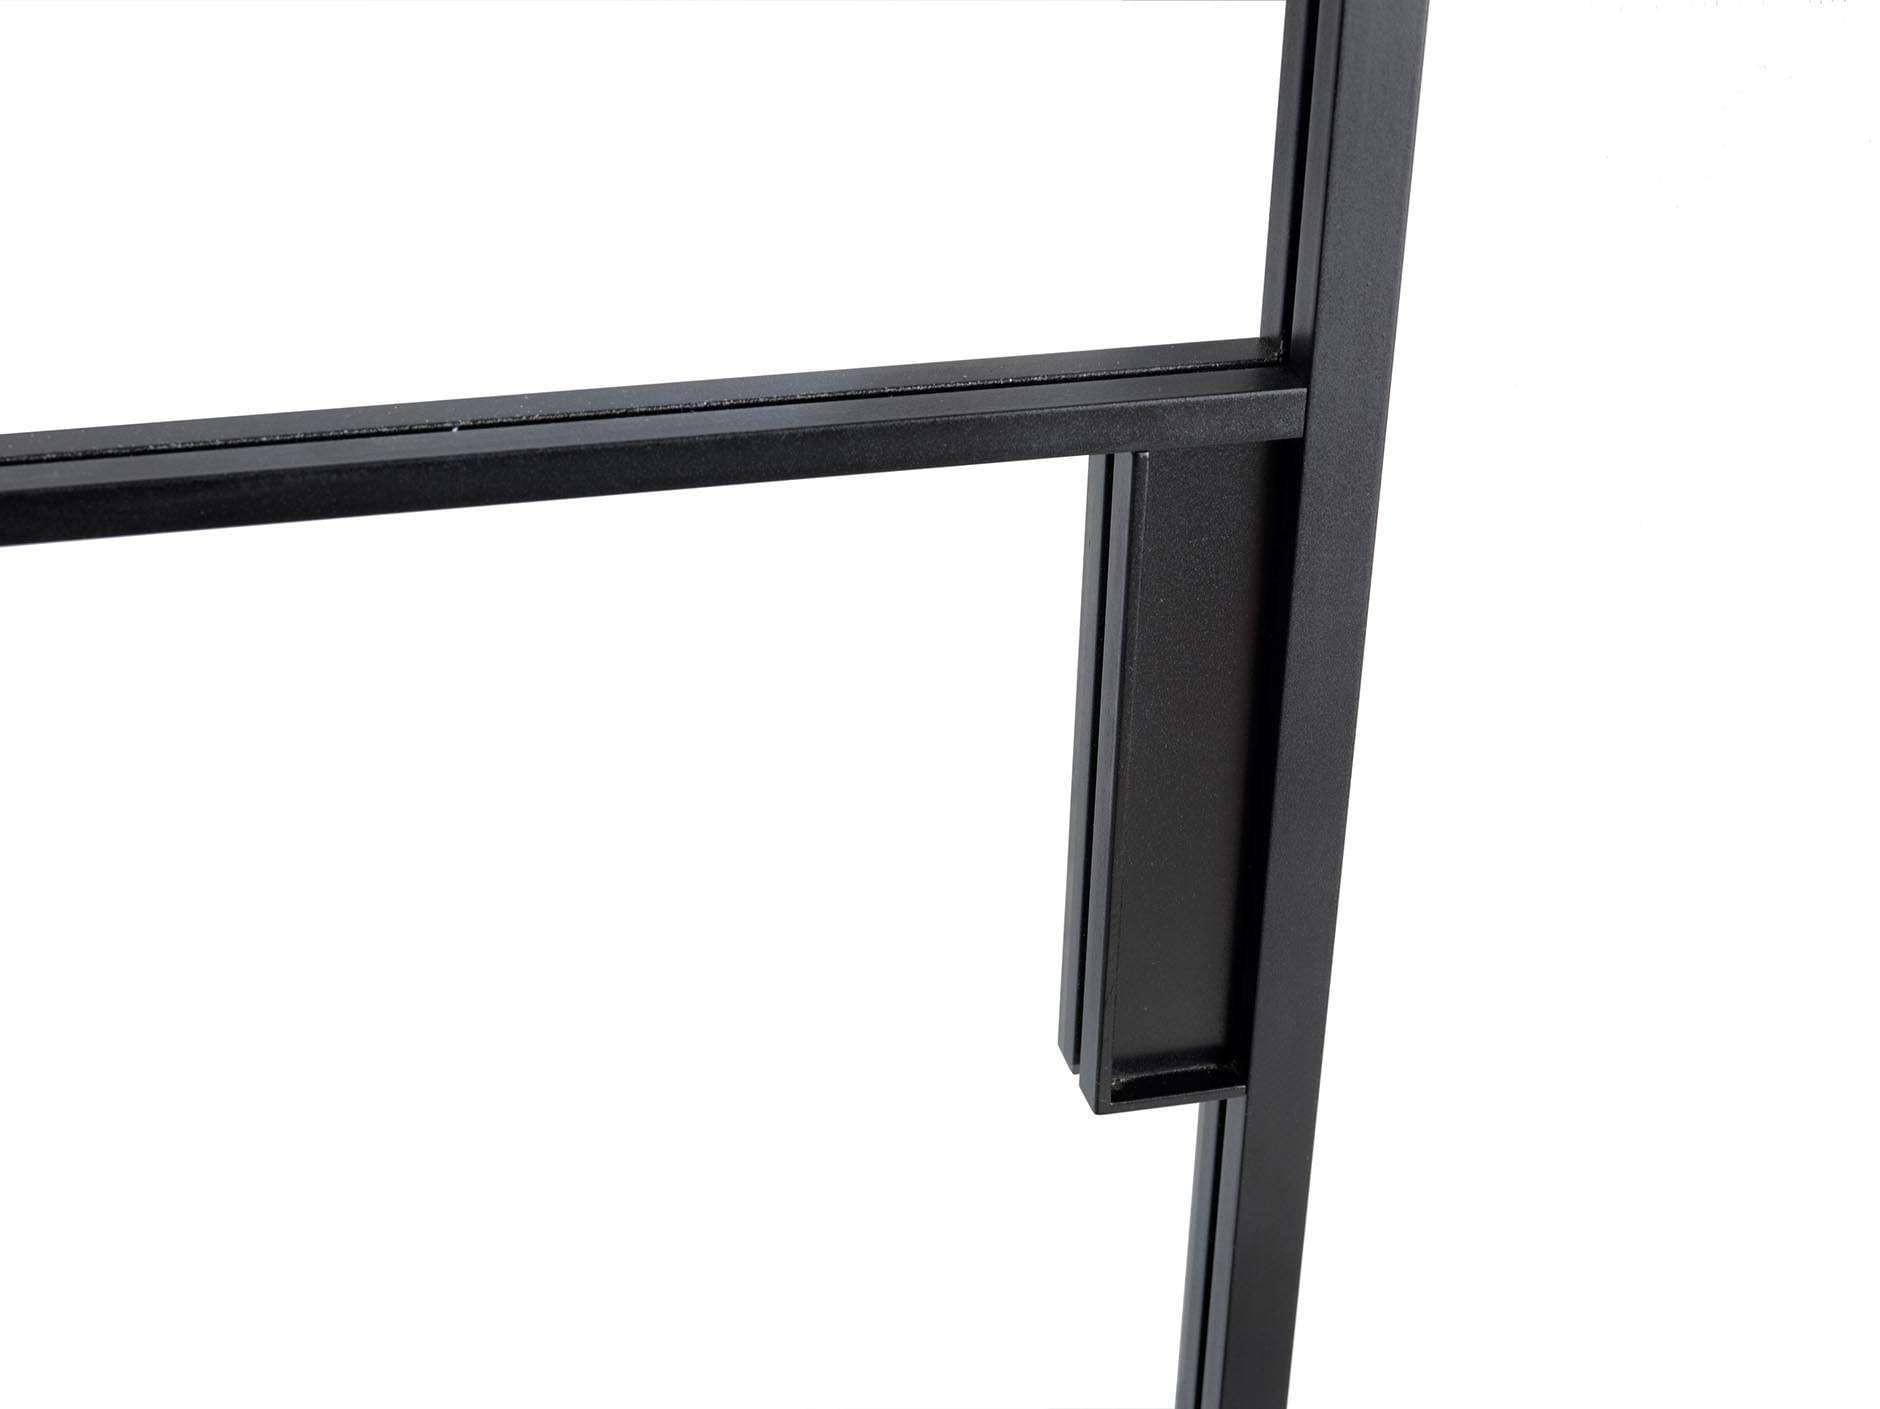 schuifdeur-fijne-zwarte-rand-glas